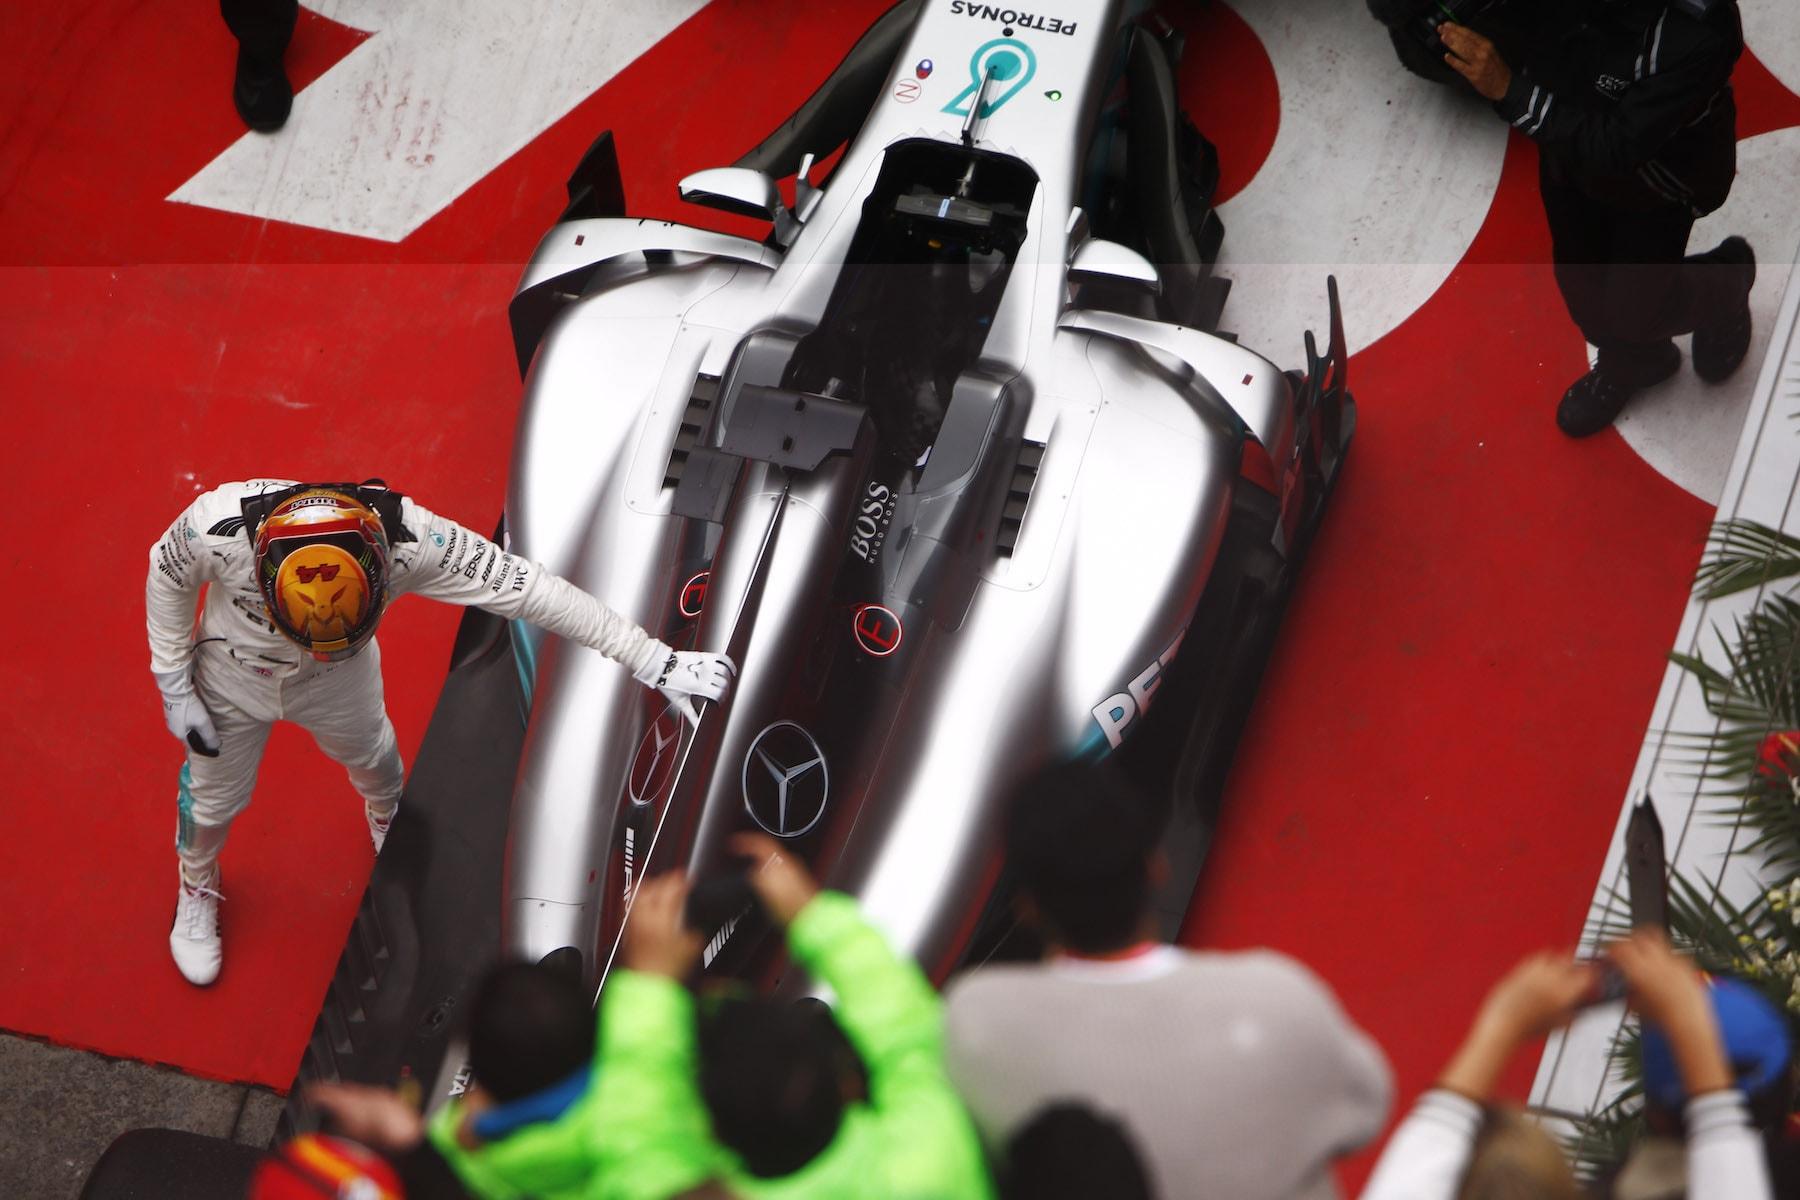 T 2017 Lewis Hamilton | Mercedes W08 | 2017 Chinese GP Winner 8 copy.jpg